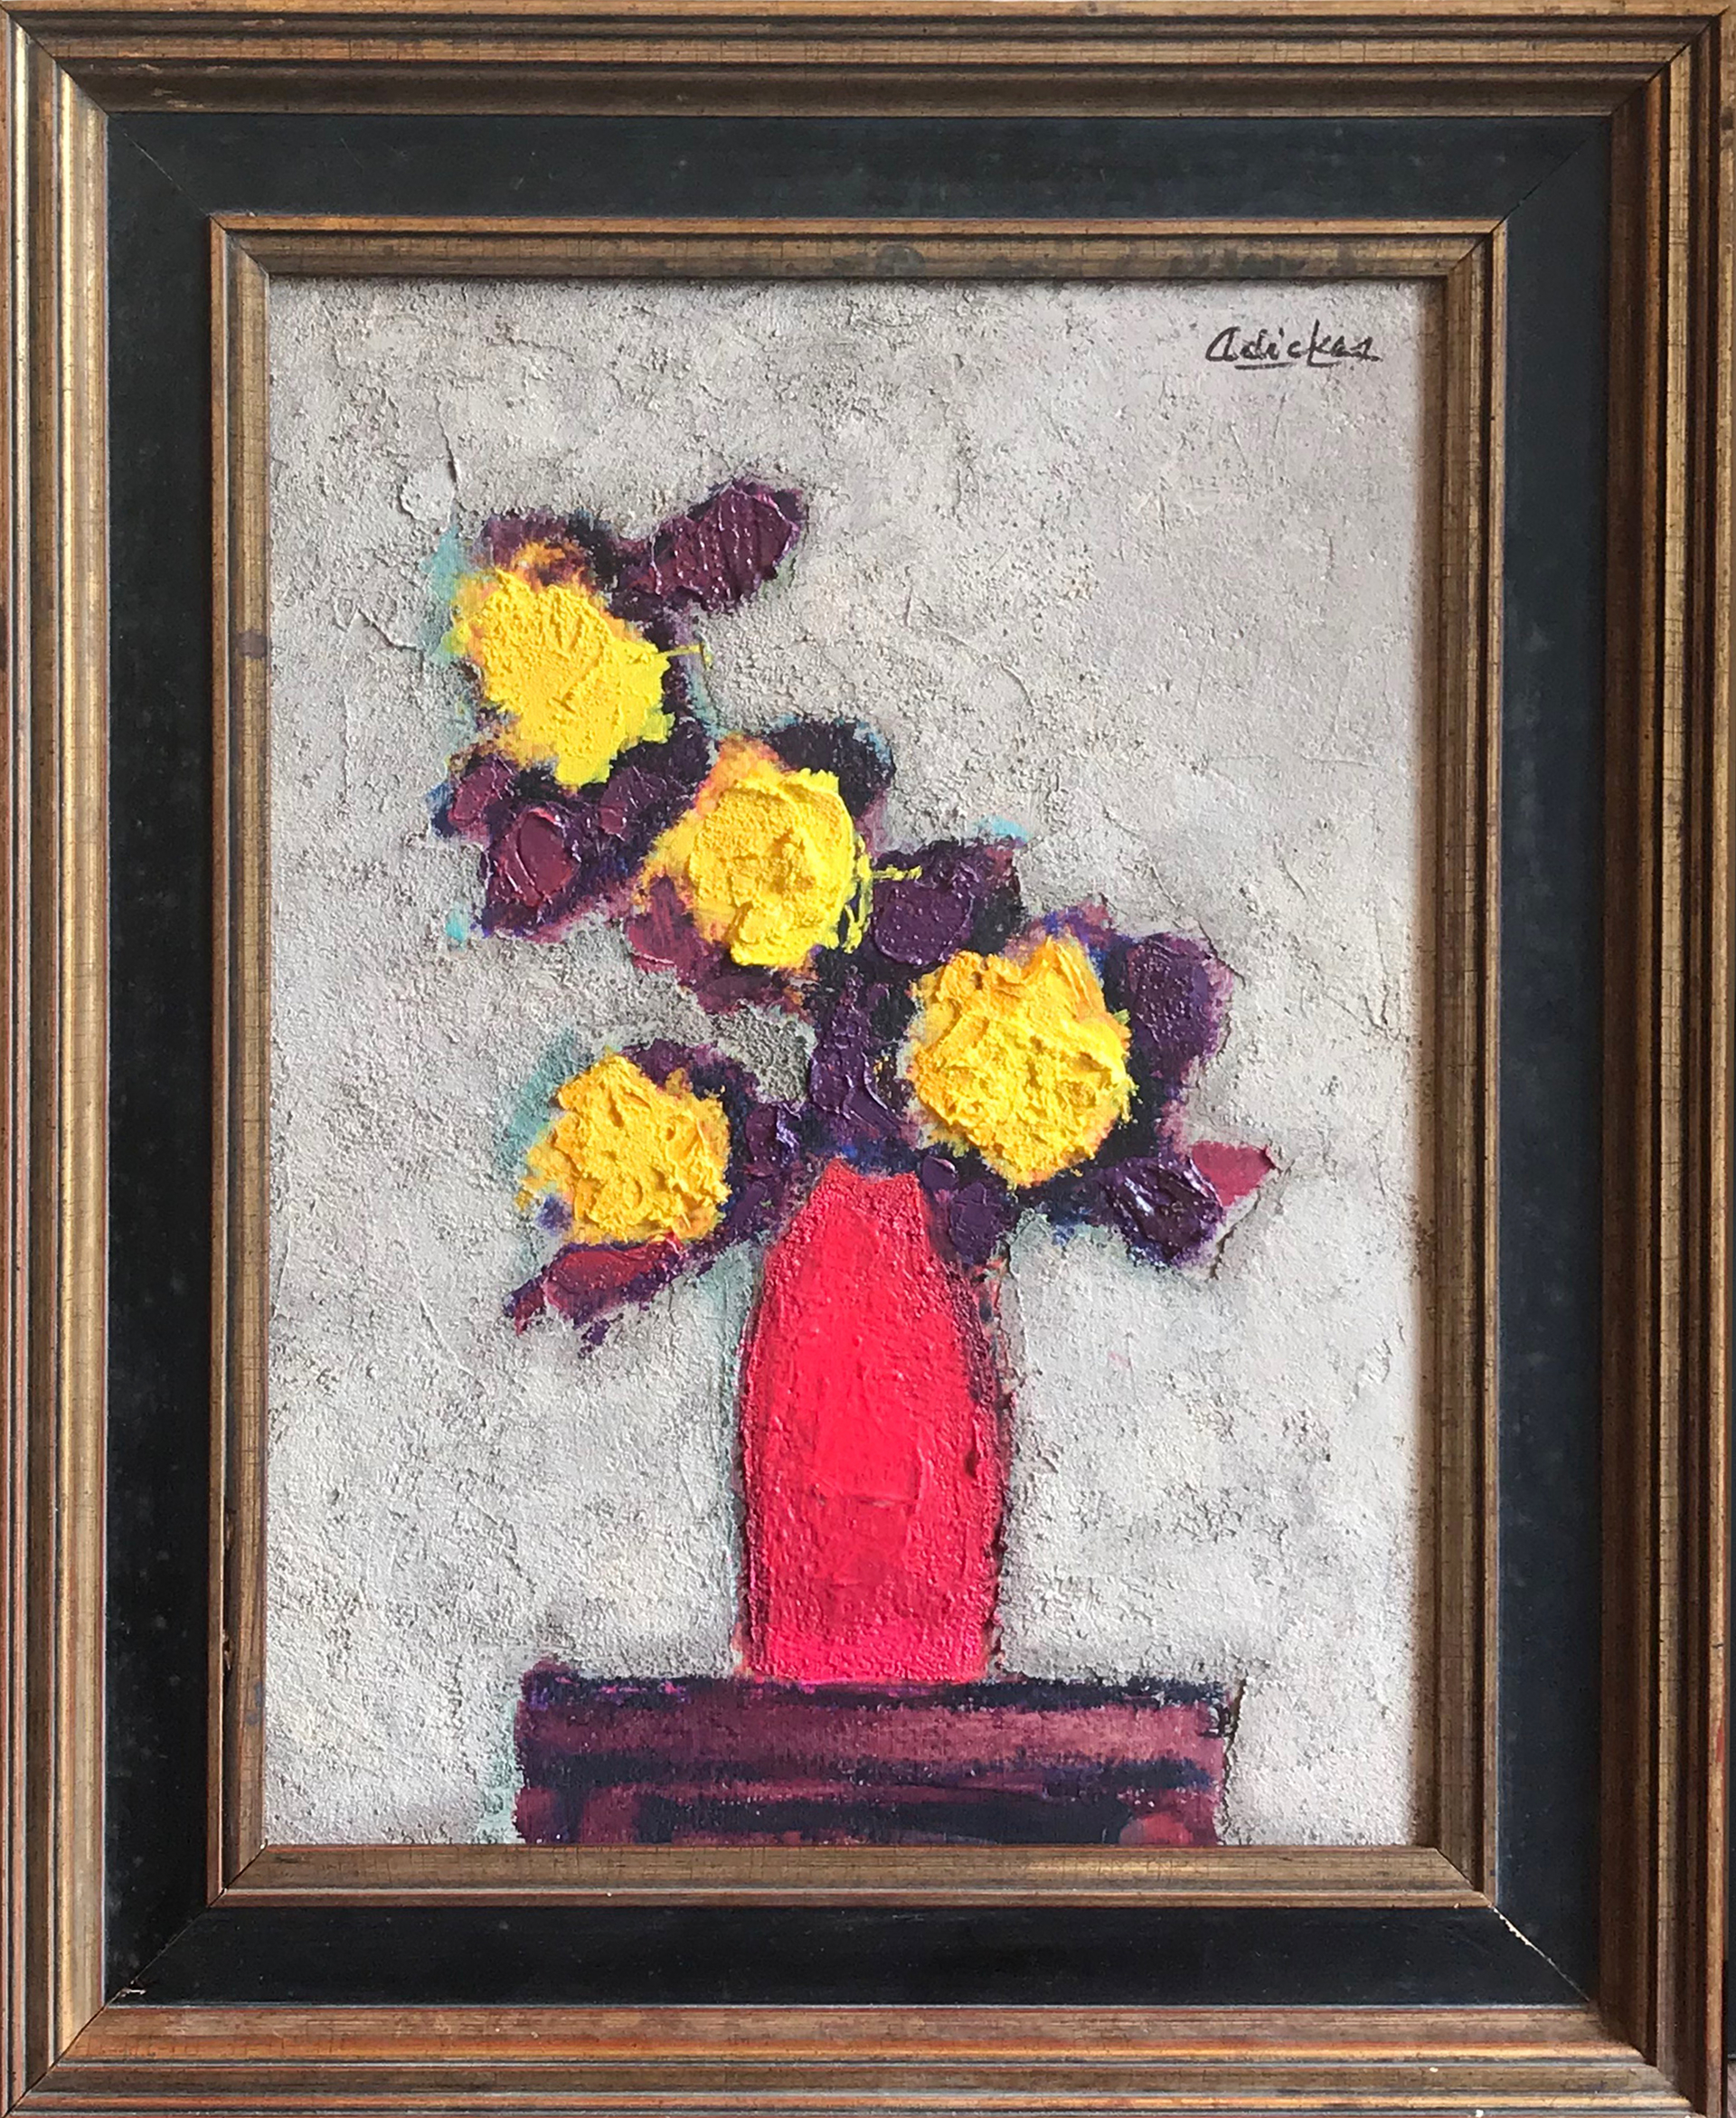 Yellow Flowers, Red Vase  by David Adickes